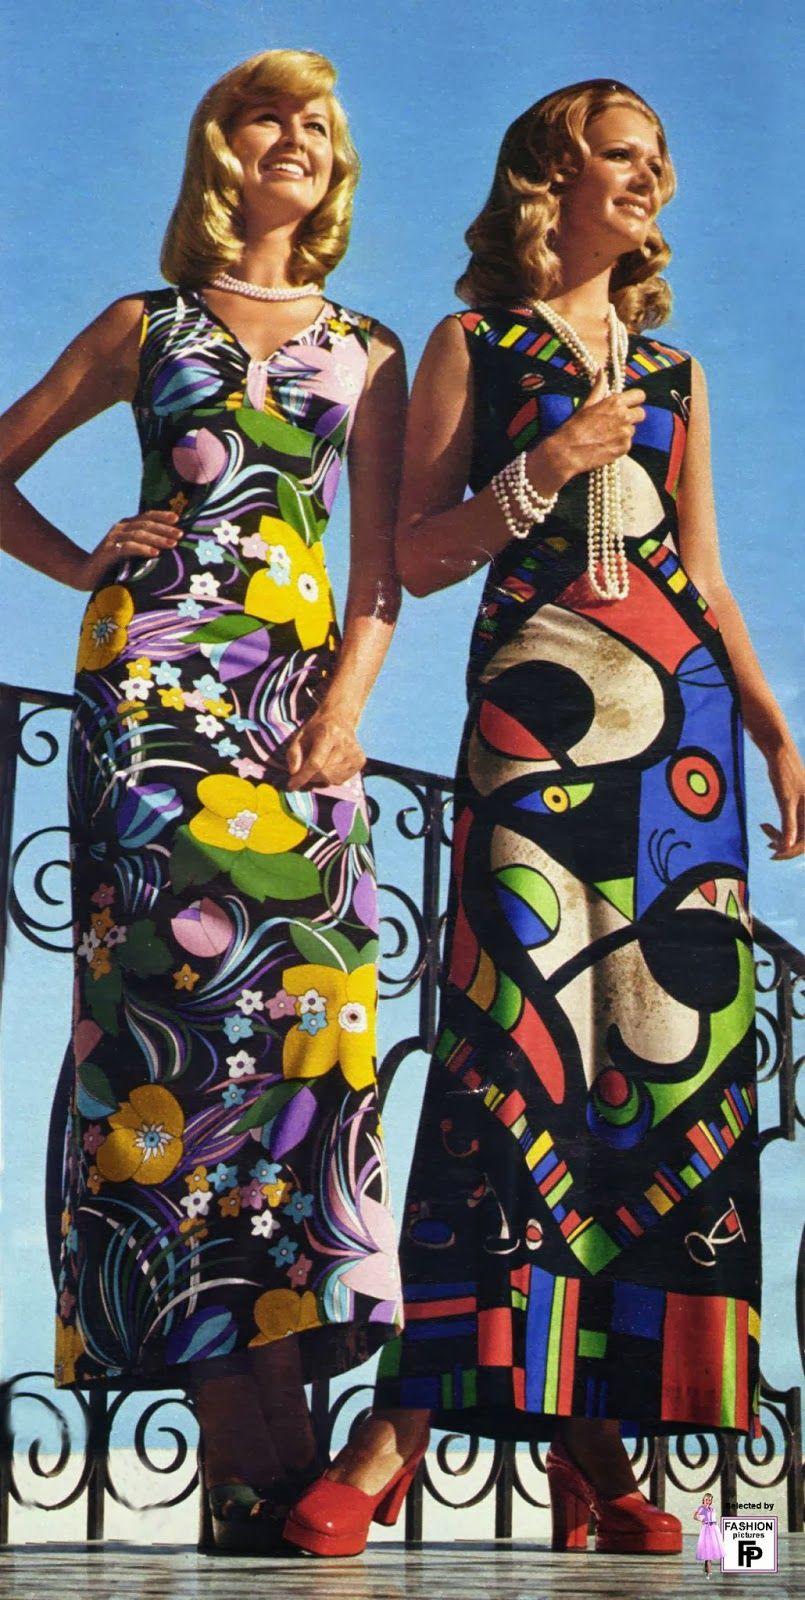 883b597f488 Roses   Tulips  The 70 s  The years of the flower power and Studio 54Los  años 70  Los años del flower power y Studio 54